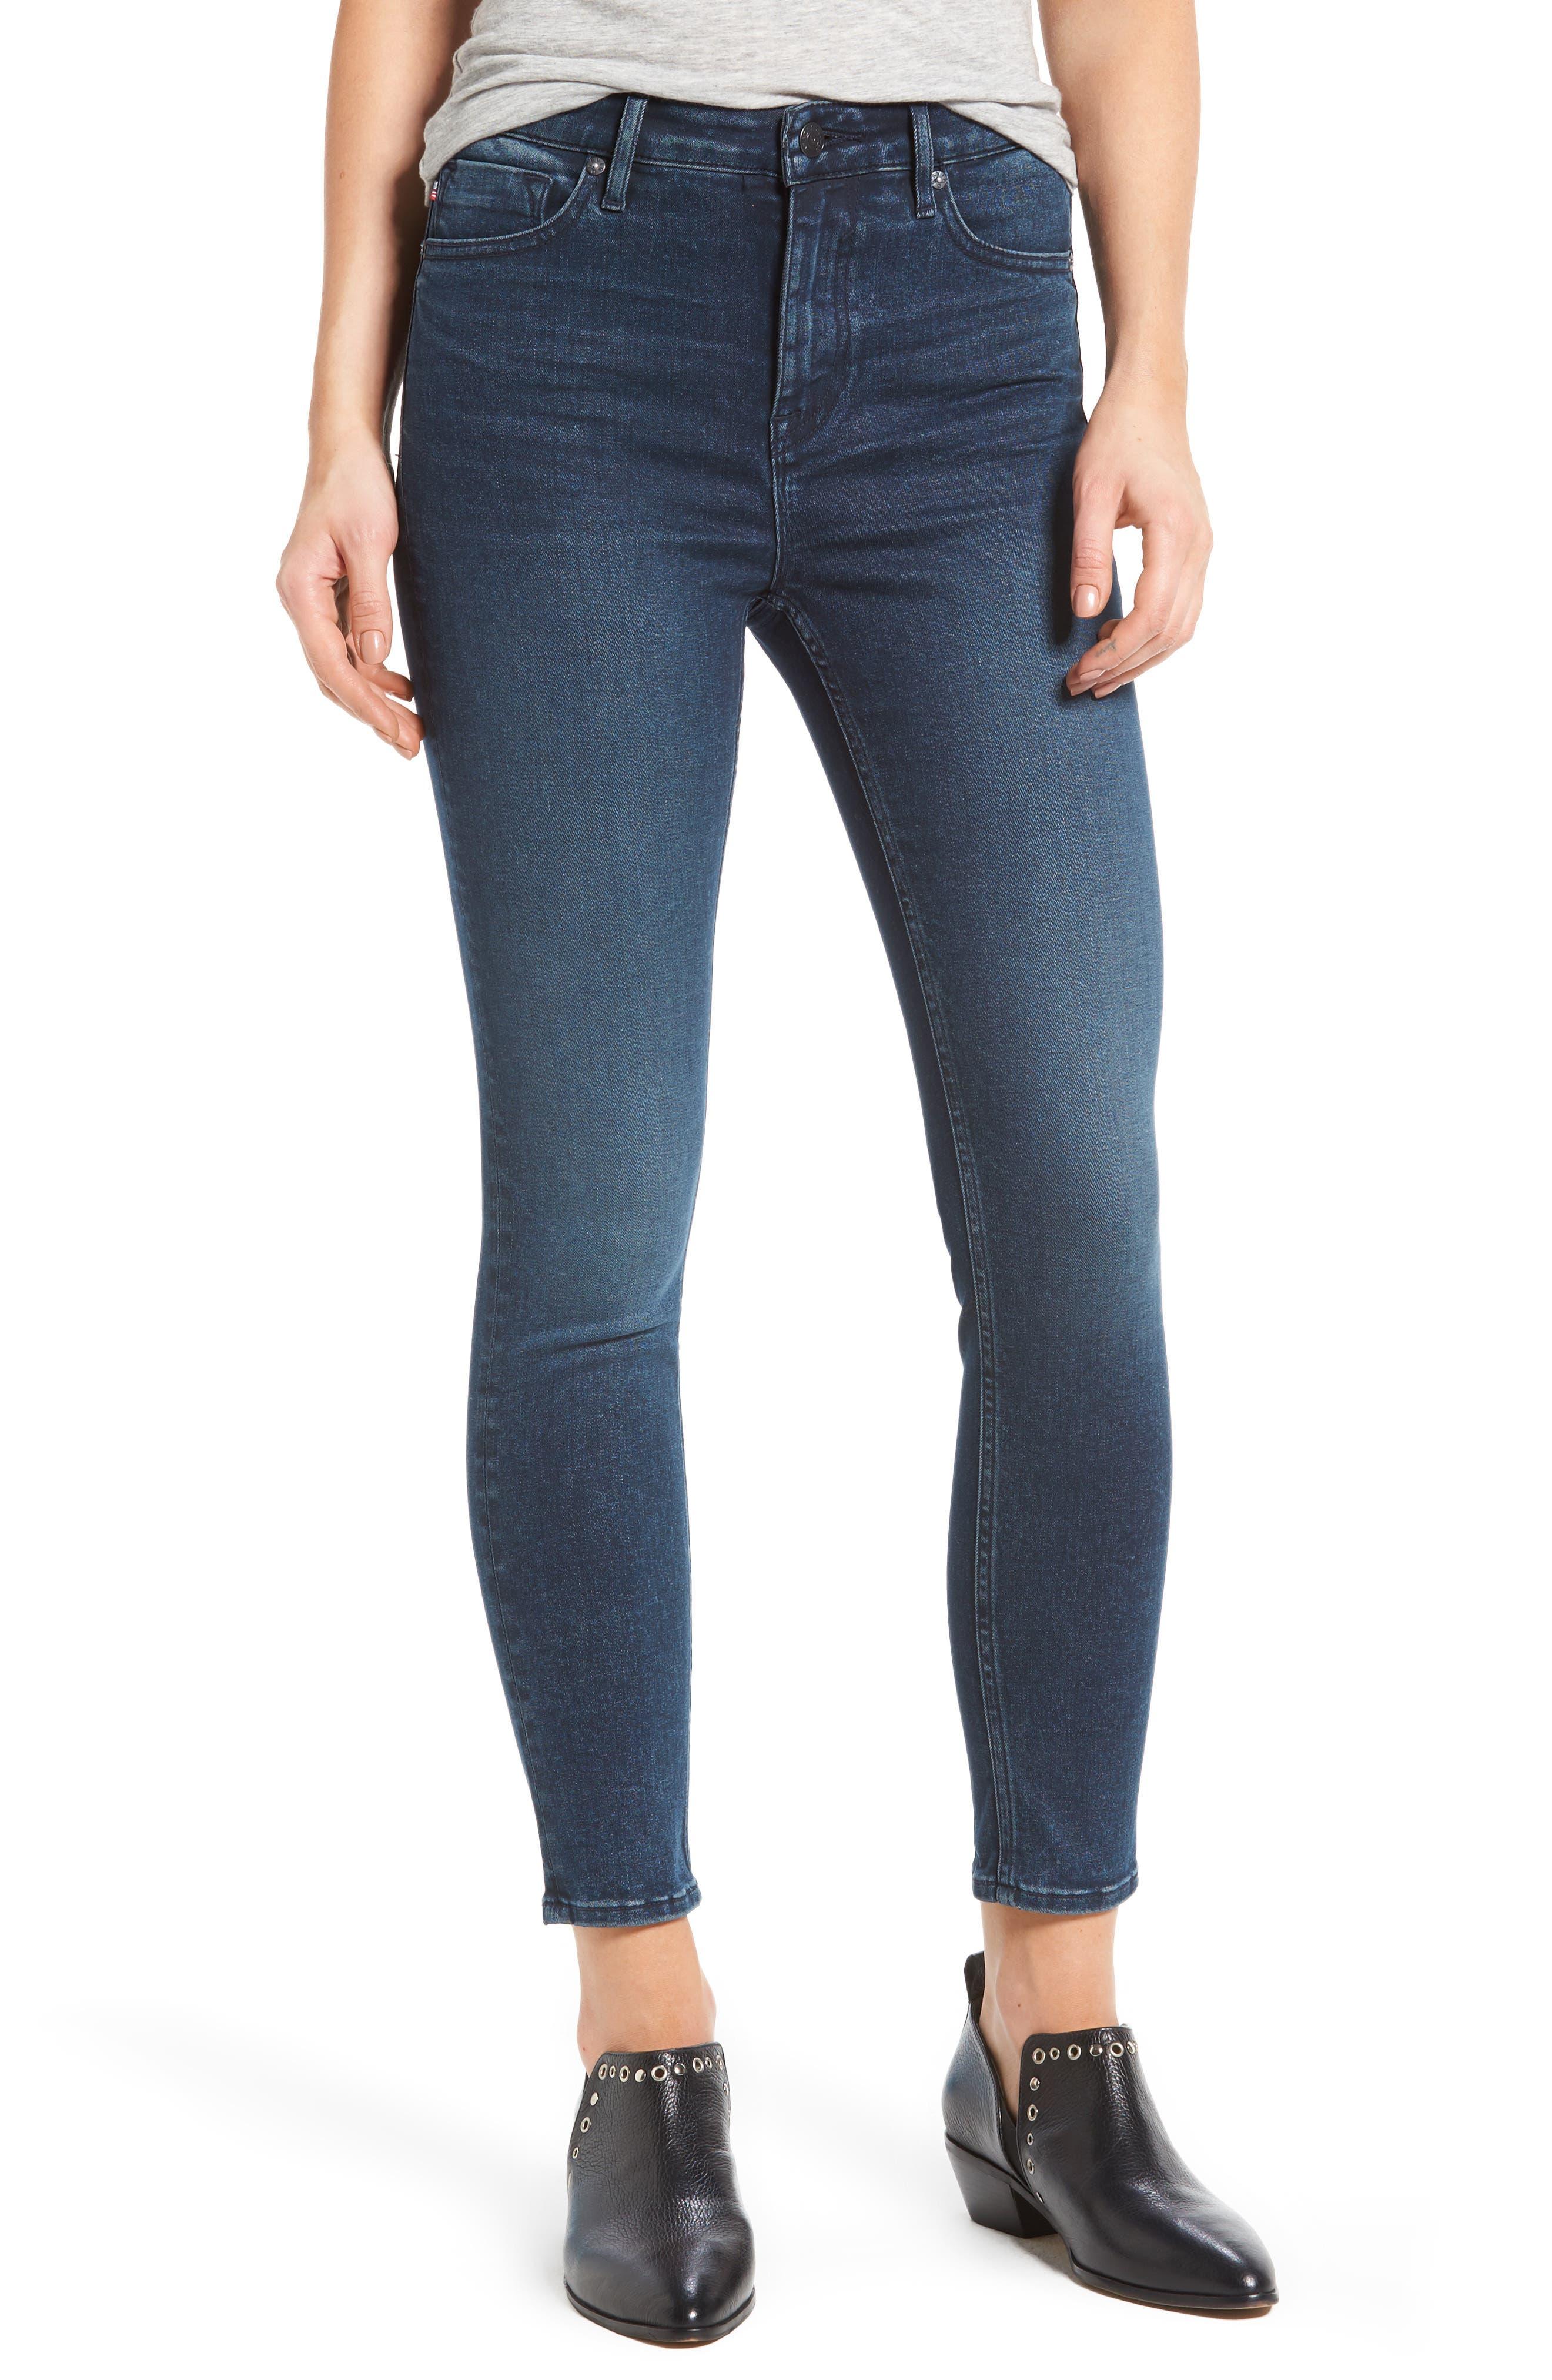 Vigoss Jagger High Waist Skinny Jeans